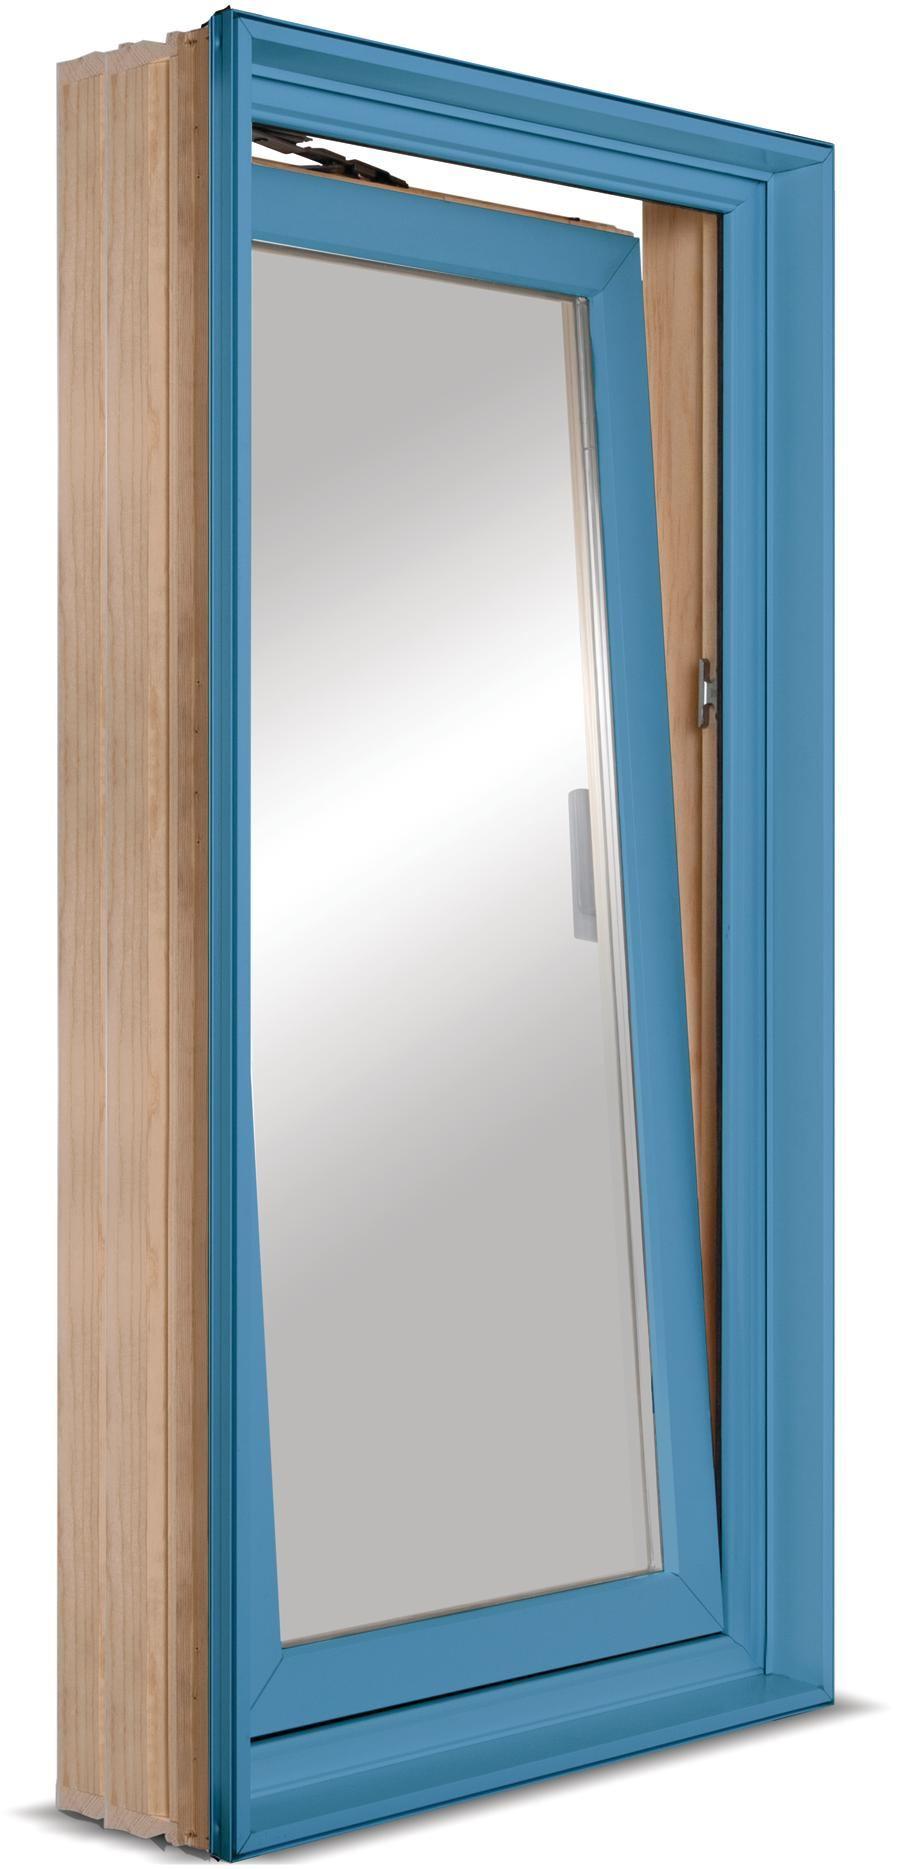 Tilt Turn Casement Window : Jeld wen custom tilt and turn windows architect magazine